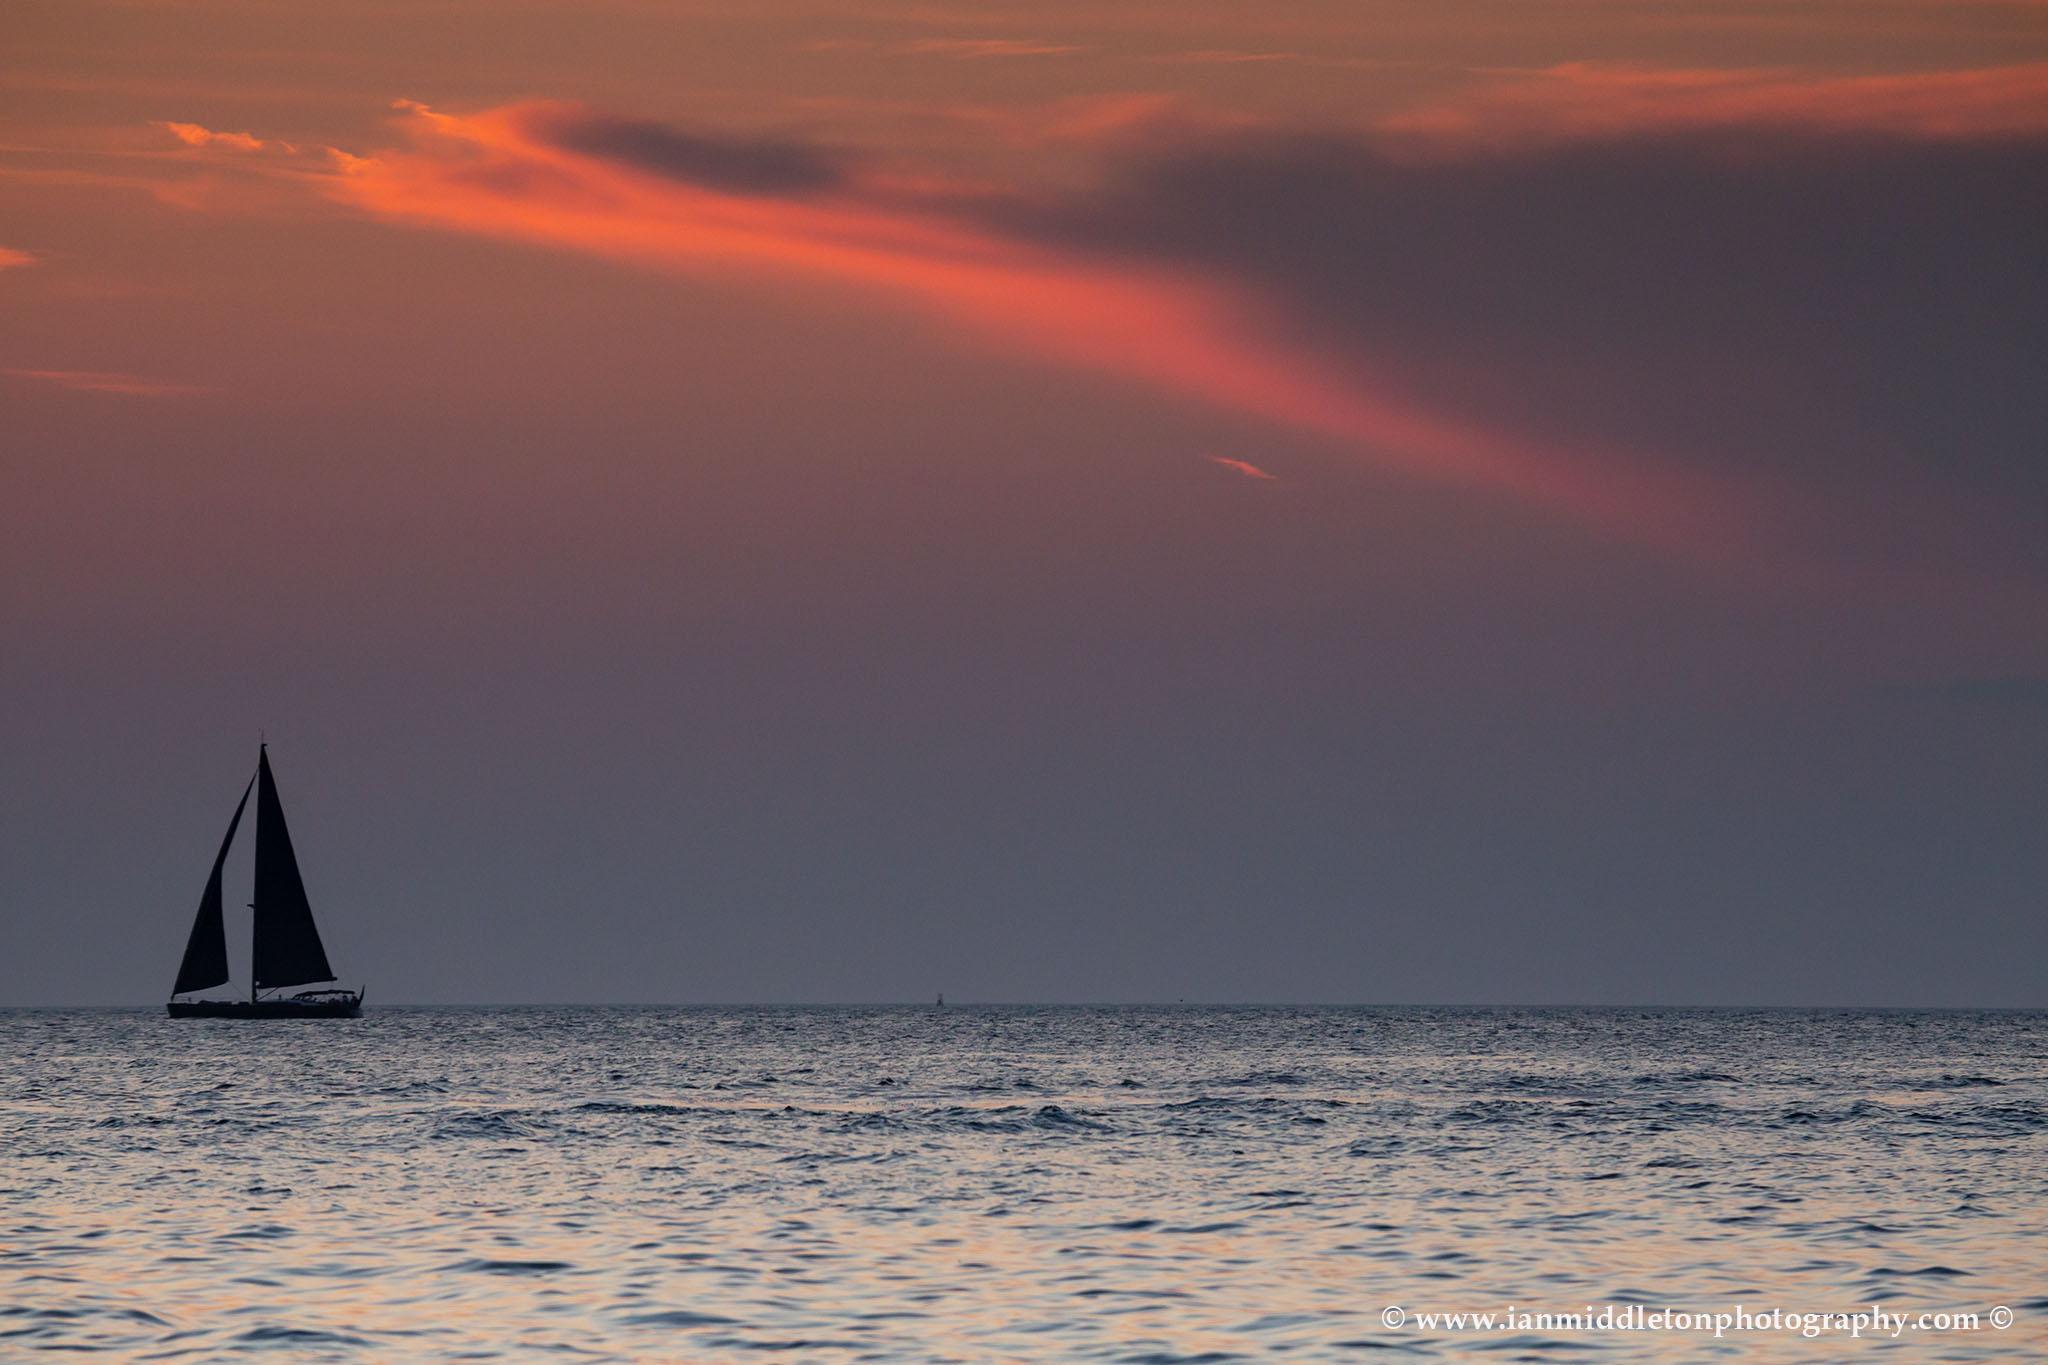 Sunset at Strunjan on the Adriatic Coast in Slovenia.